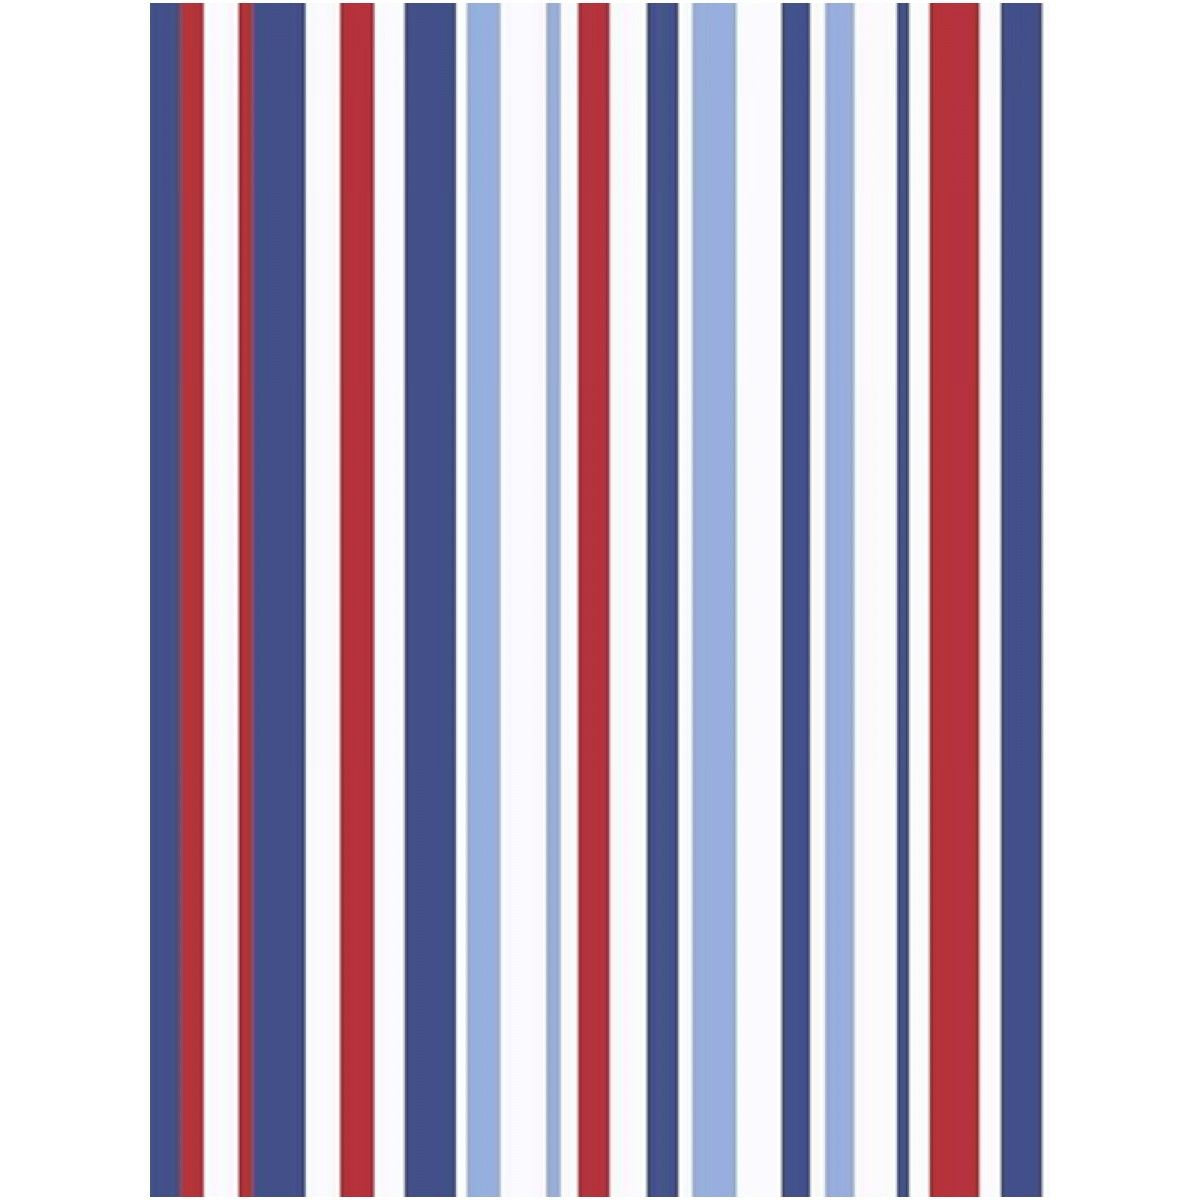 Stripe Wallpaper Red Cream Grey Direct Wallpapers E40910 Striped Wallpaper Red Striped Wallpaper Red Wallpaper